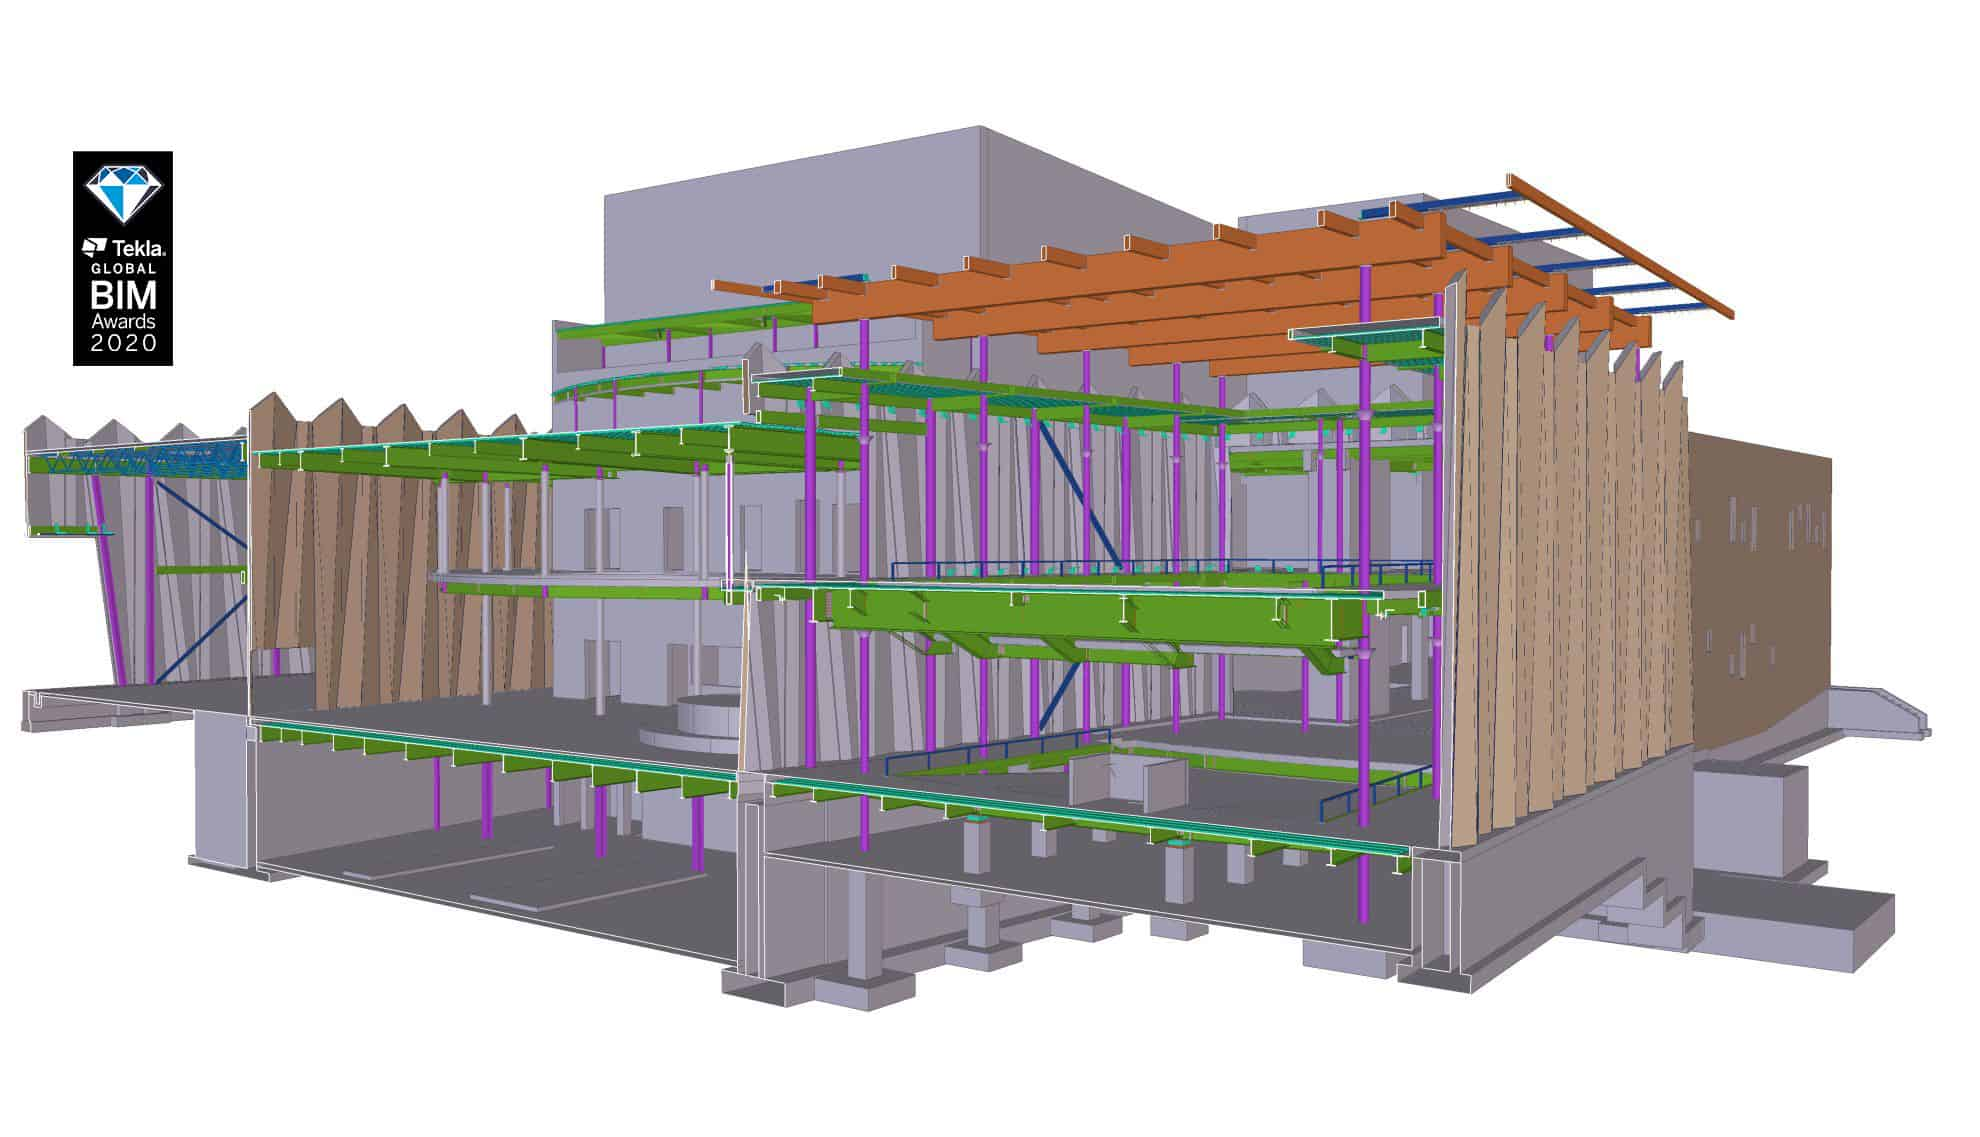 snap_086-HD - Steel concrete & rebar detailing, Tekla structural design & consulting. JMT Consultants